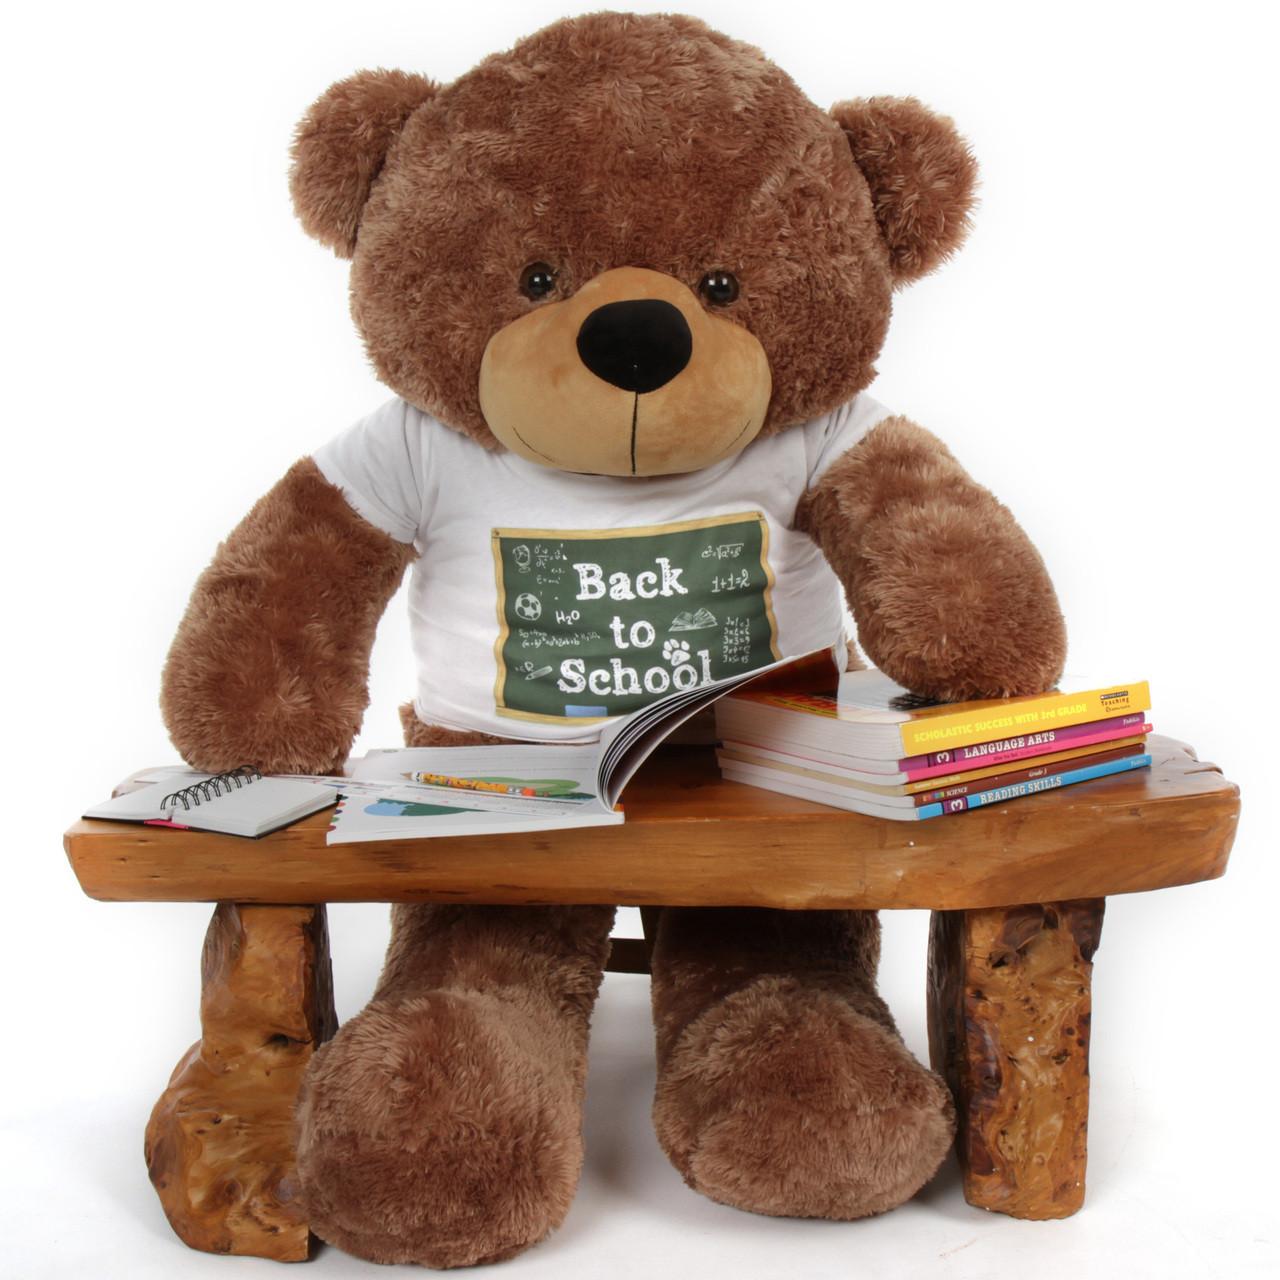 Personalized Back to School Teddy Bear